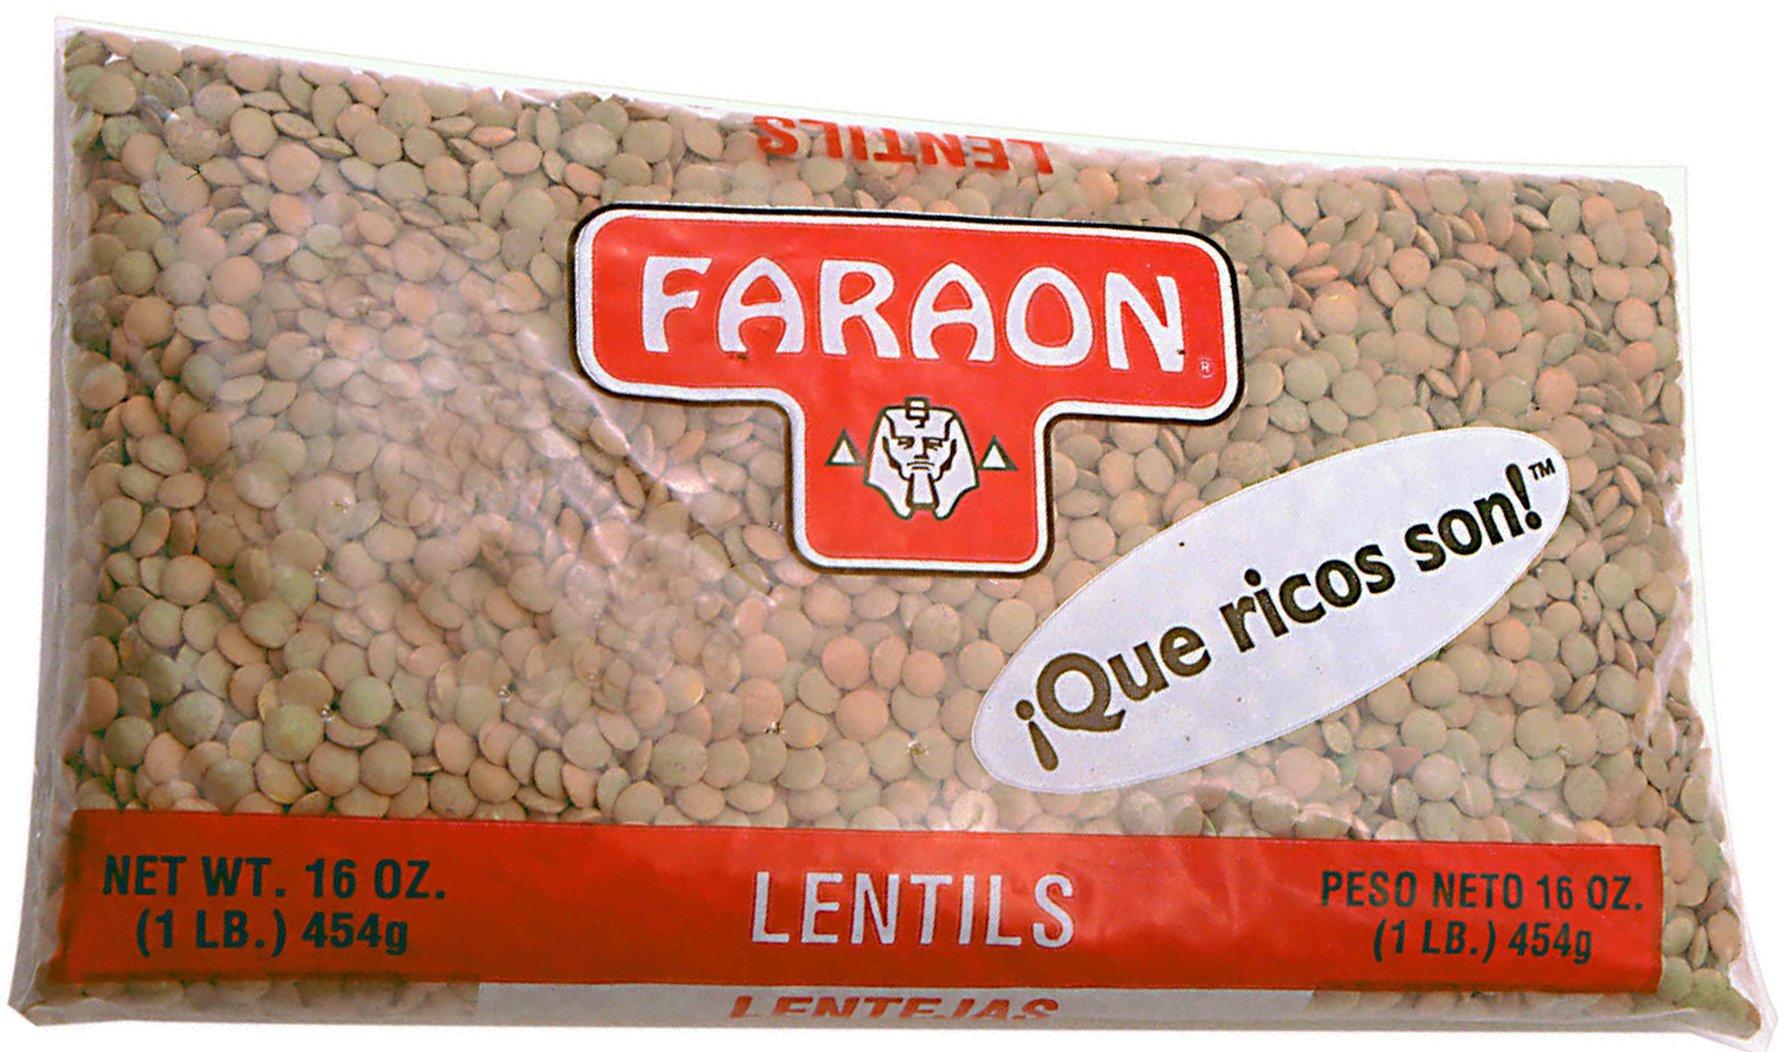 FARAON Lentils, 1 Pound (Pack of 24)